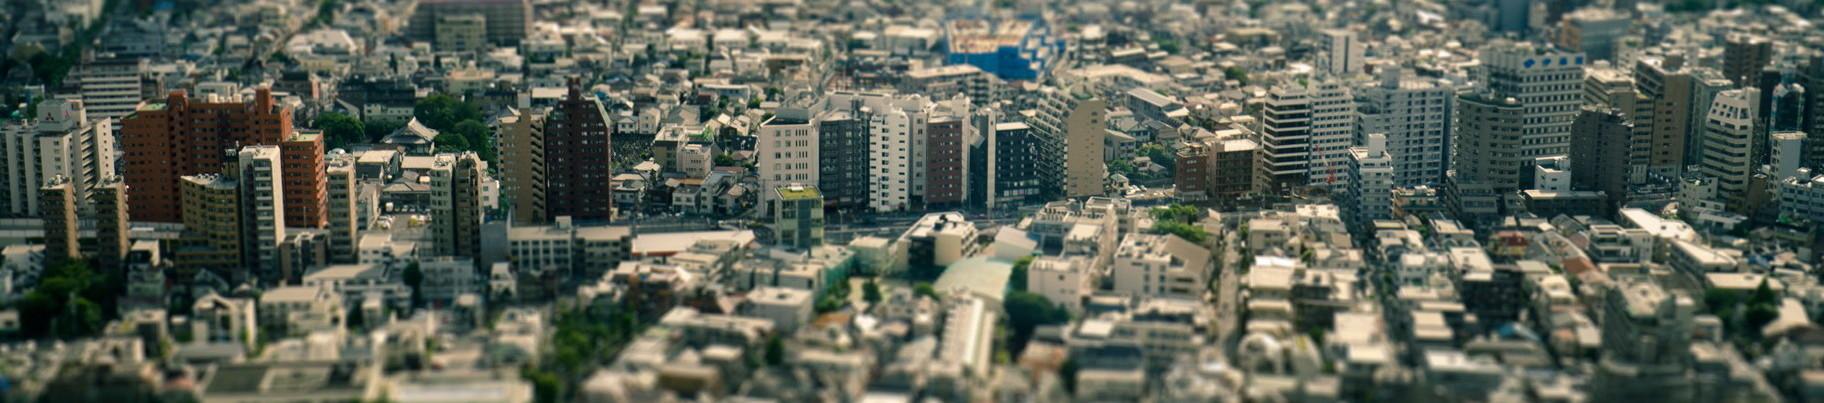 big_city_1